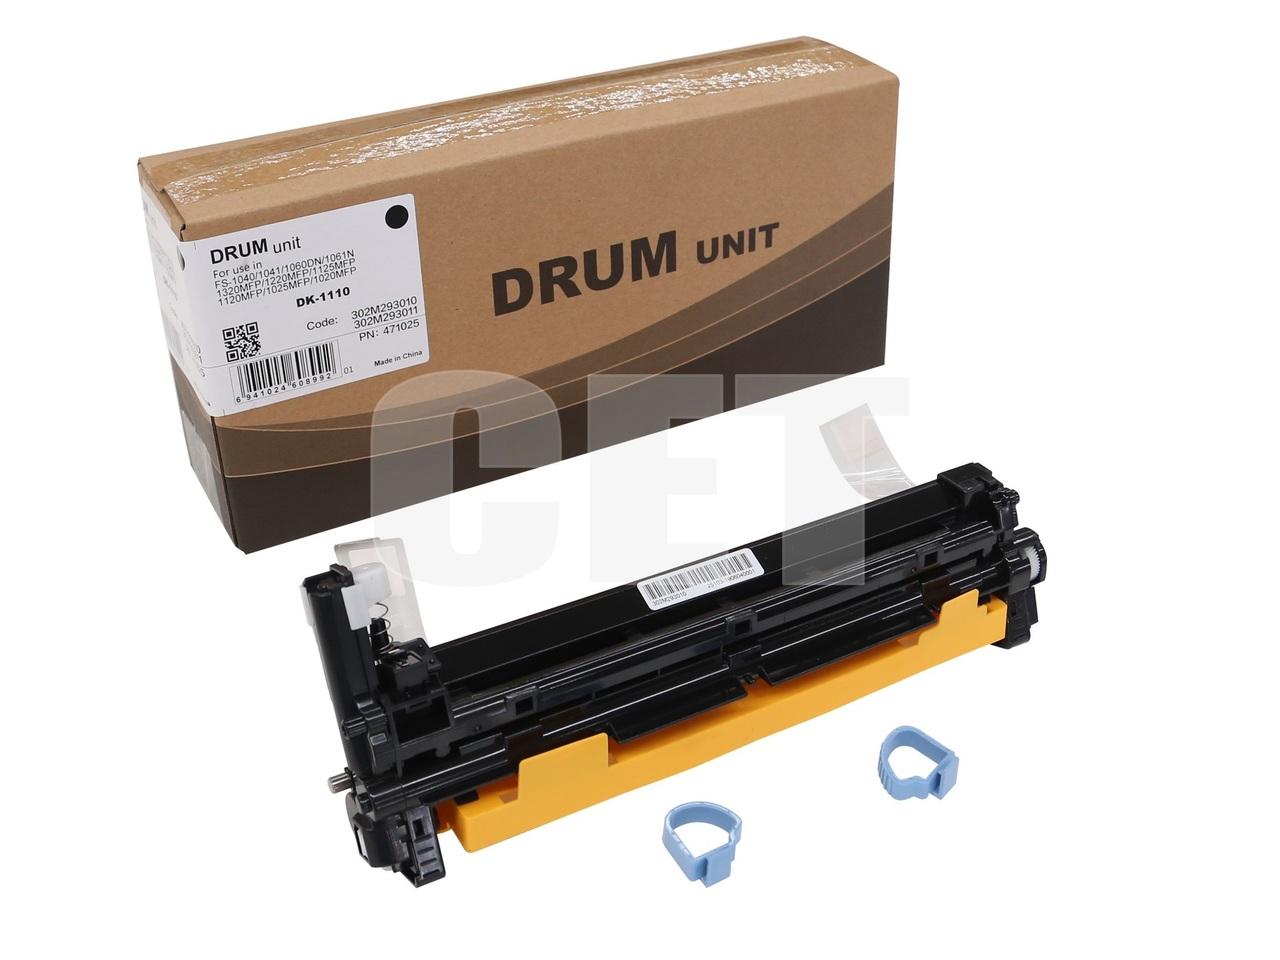 Драм-юнит DK-1110 для KYOCERAFS-1040/1060DN/1320MFP/1120MFP (CET), 100000 стр.,CET471025